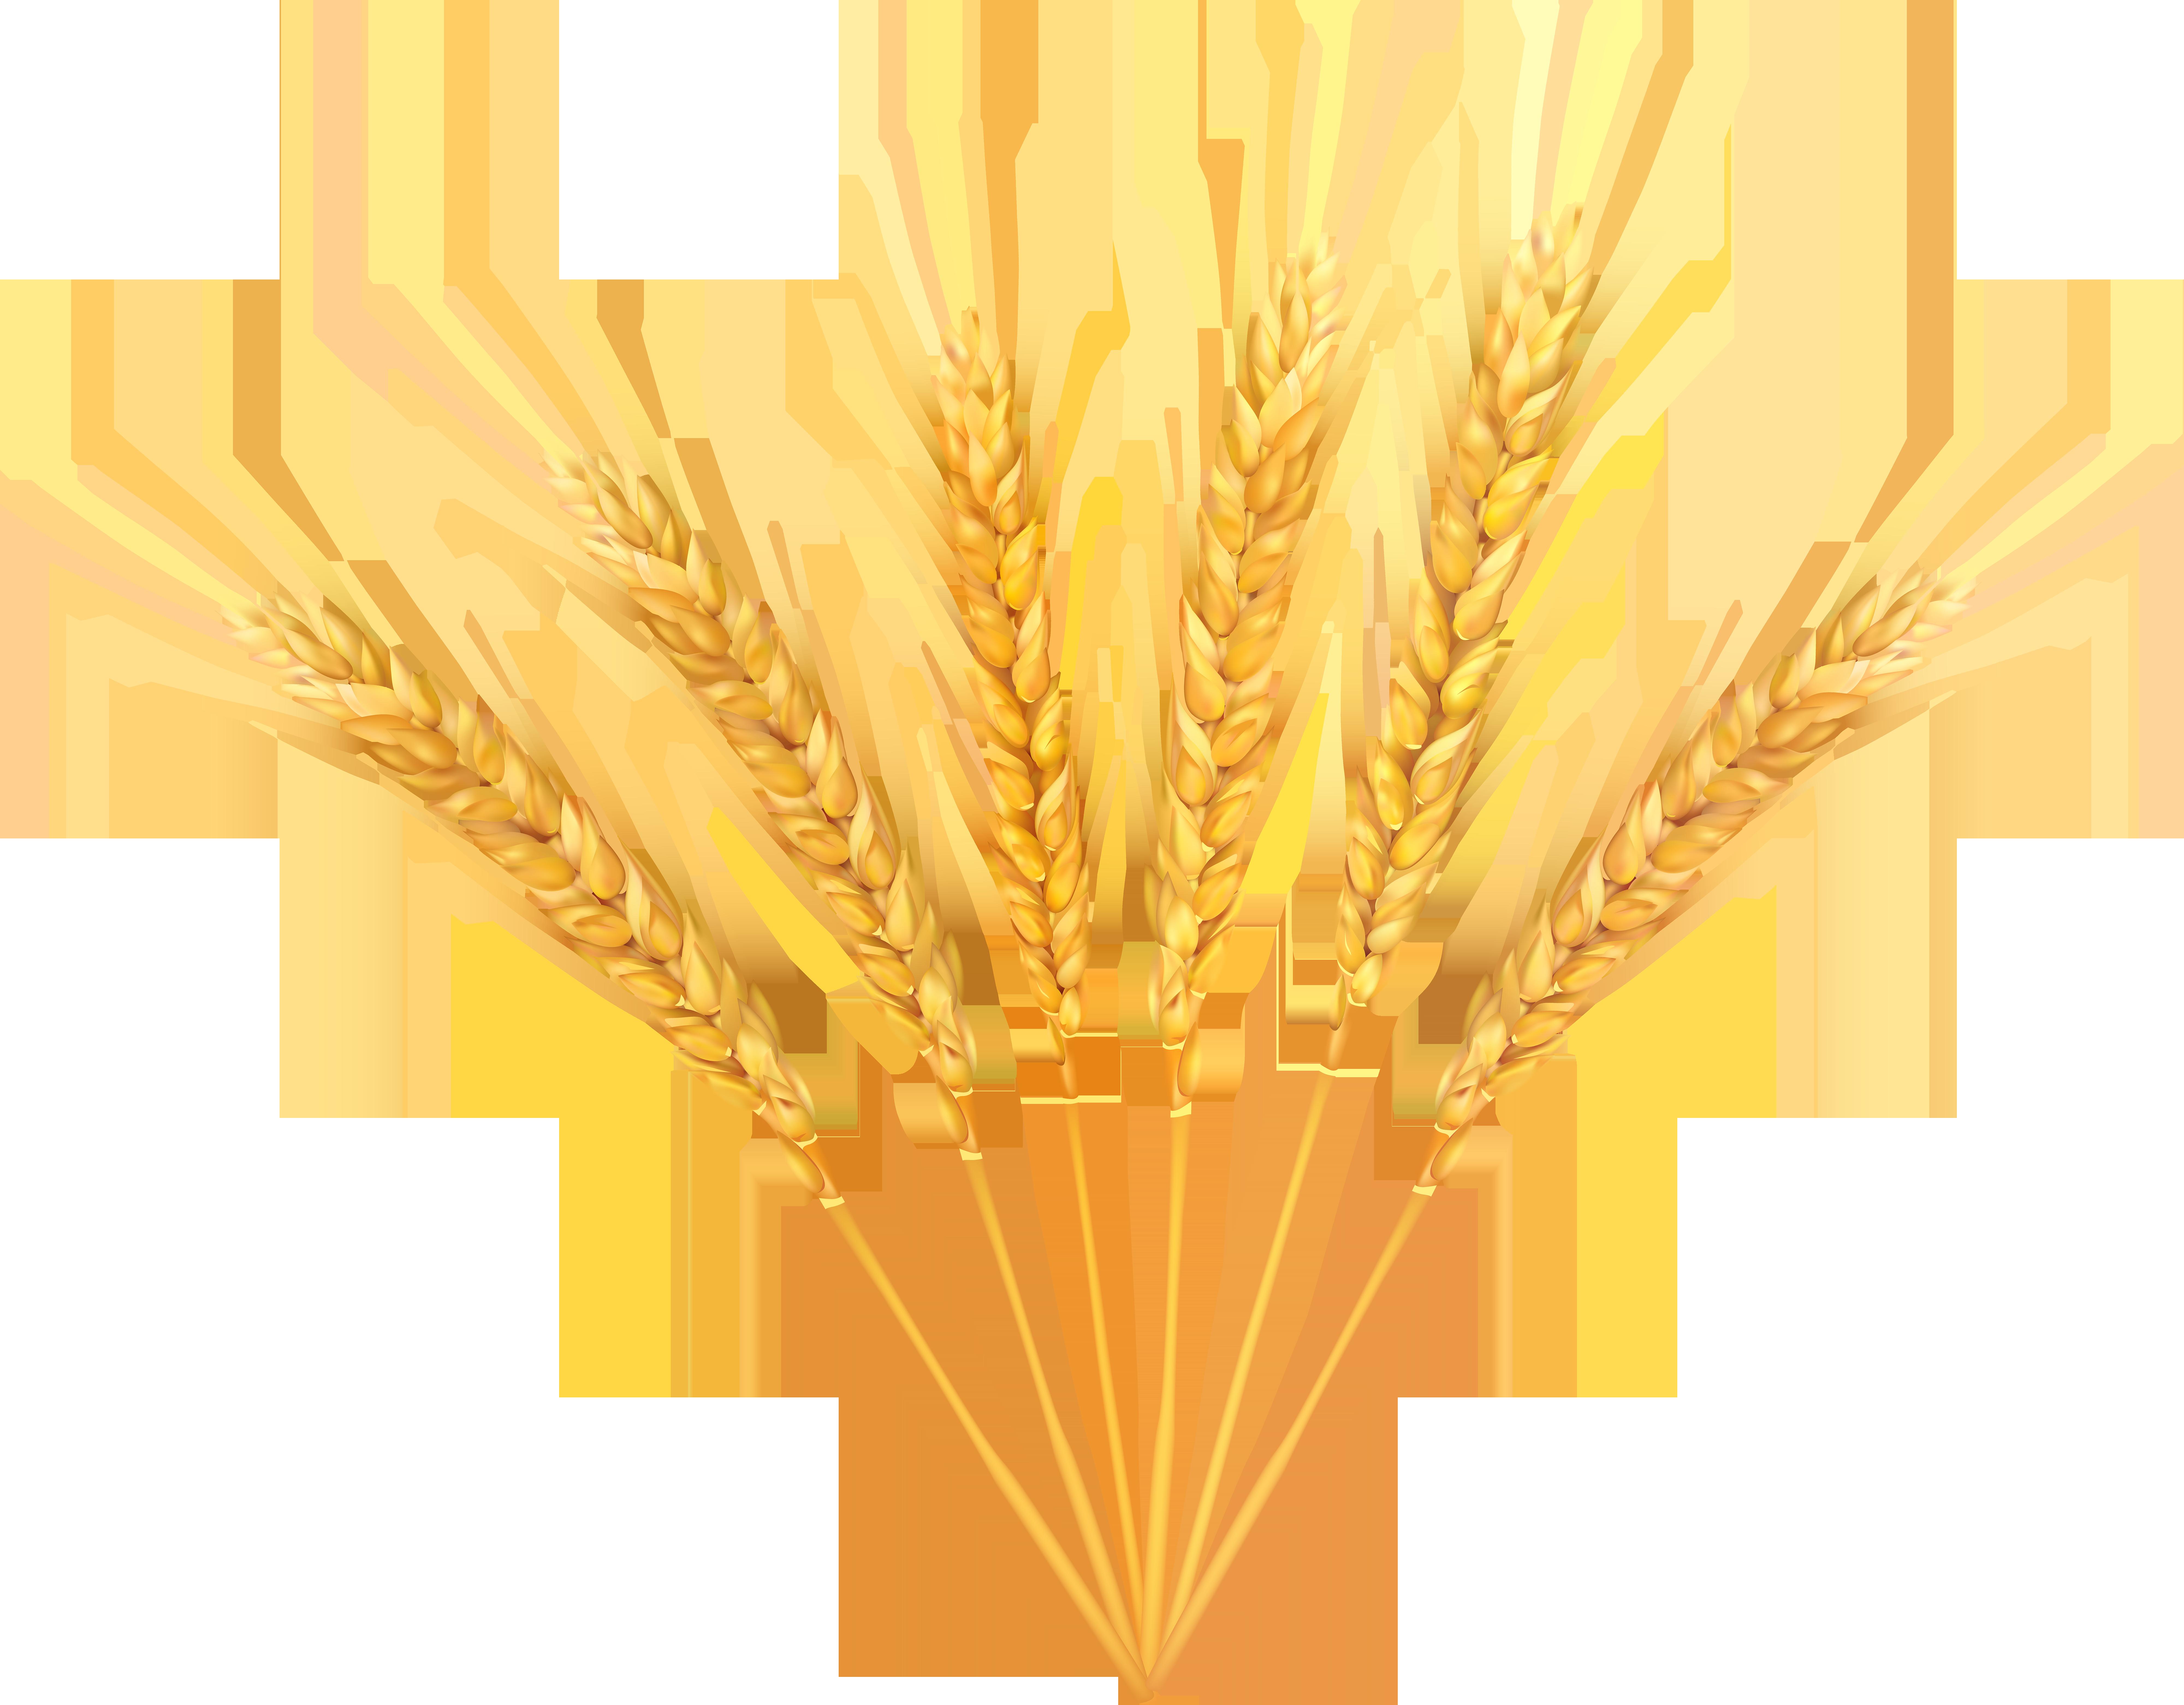 Wheat Decoration PNG Clip Art Image.